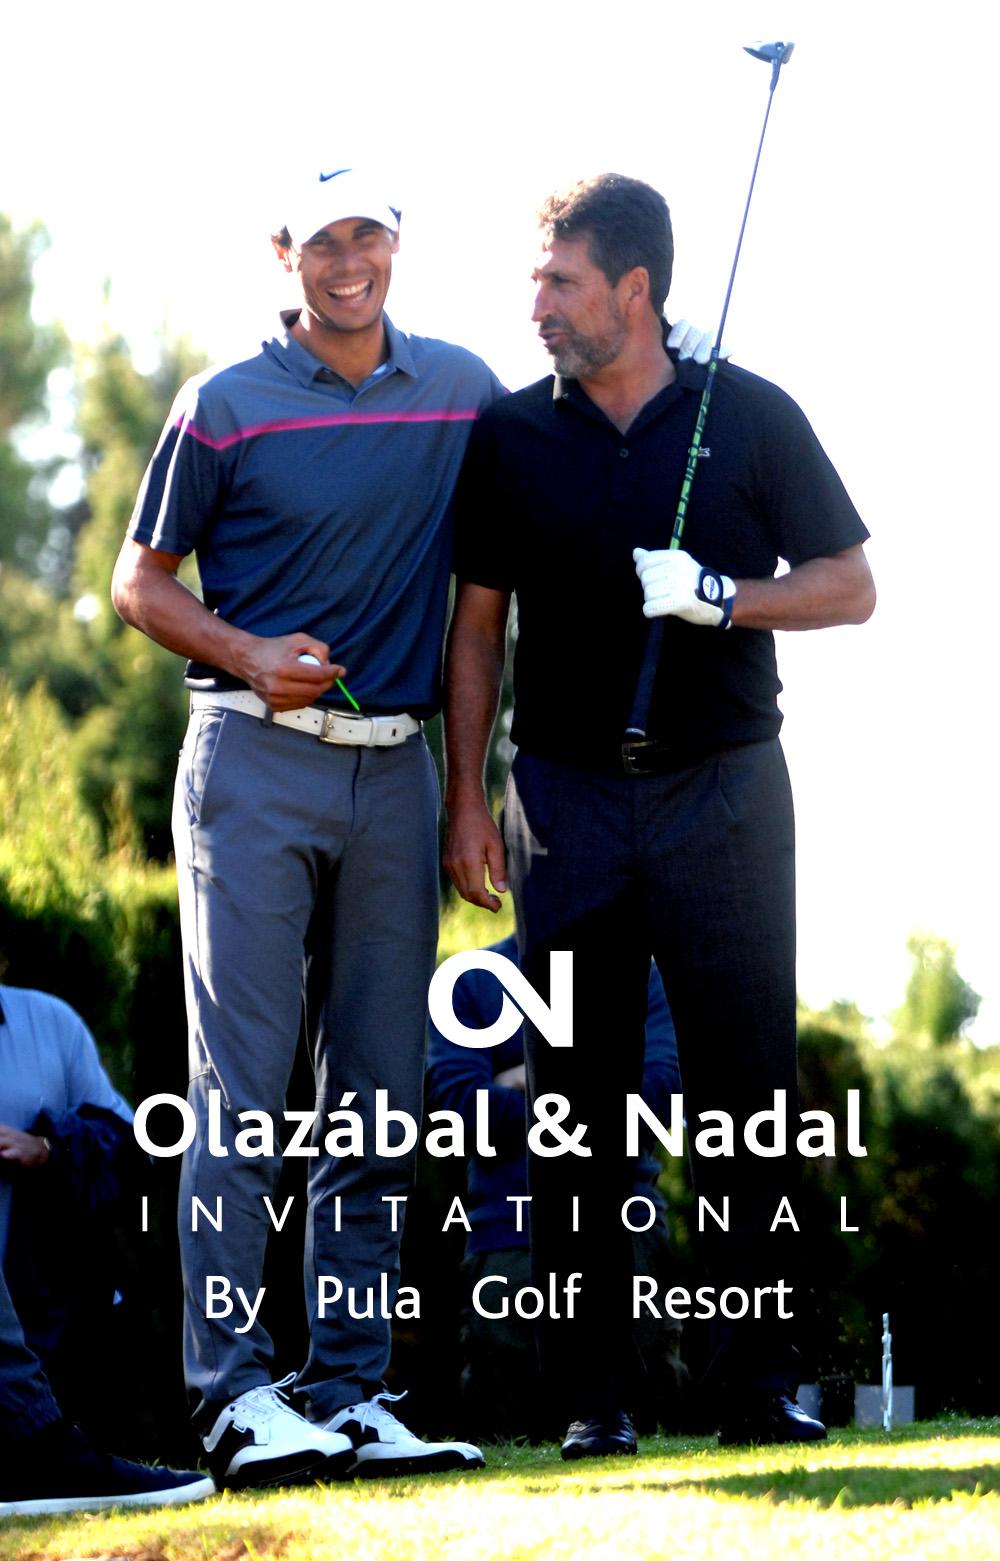 torneo de golf Olazabal & Nadal